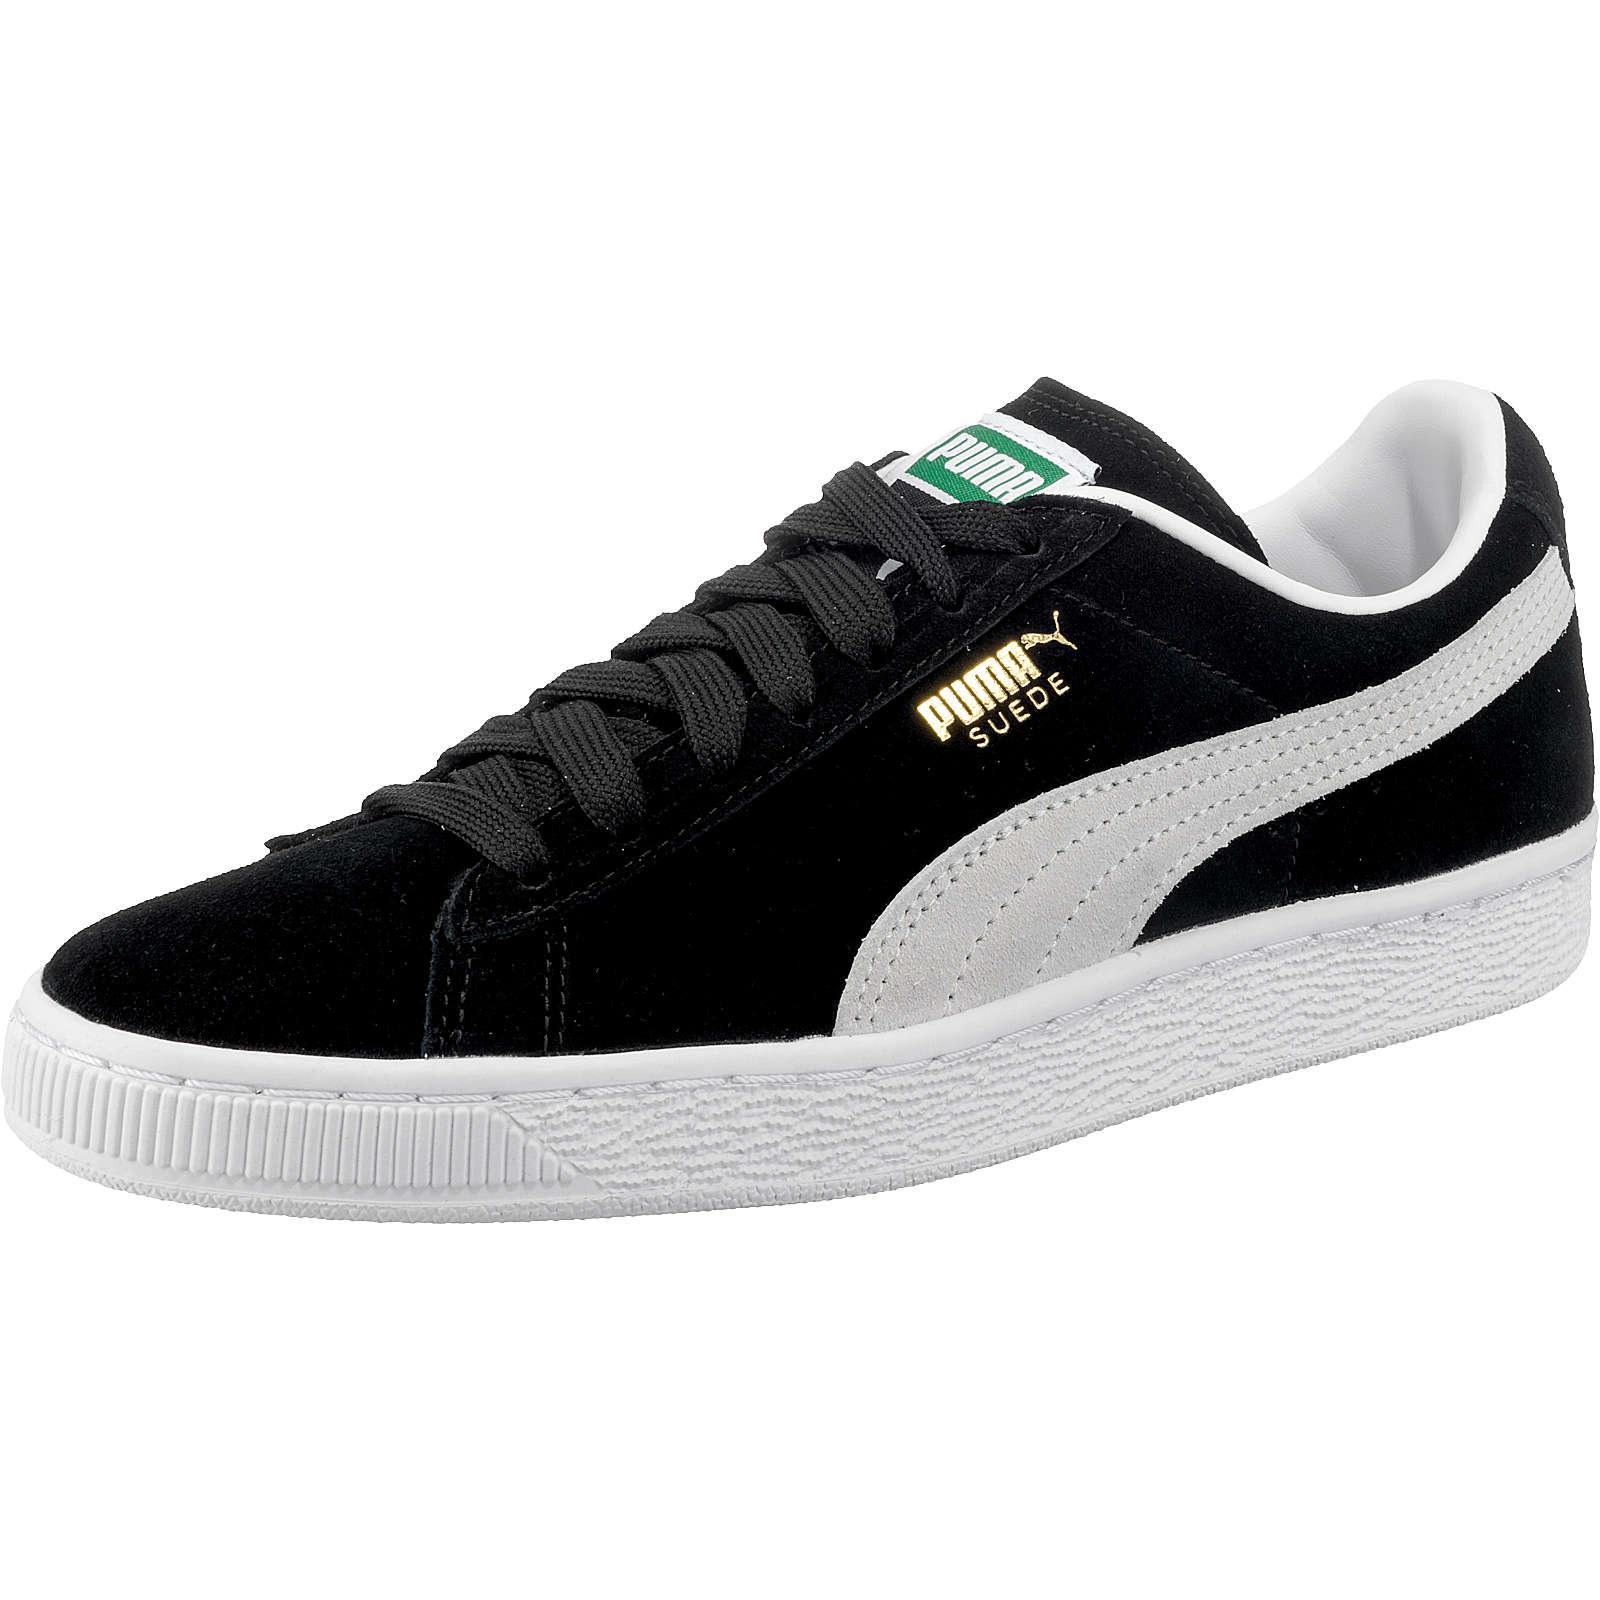 PUMA Suede Classic+ Sneakers schwarz Damen Gr. 39